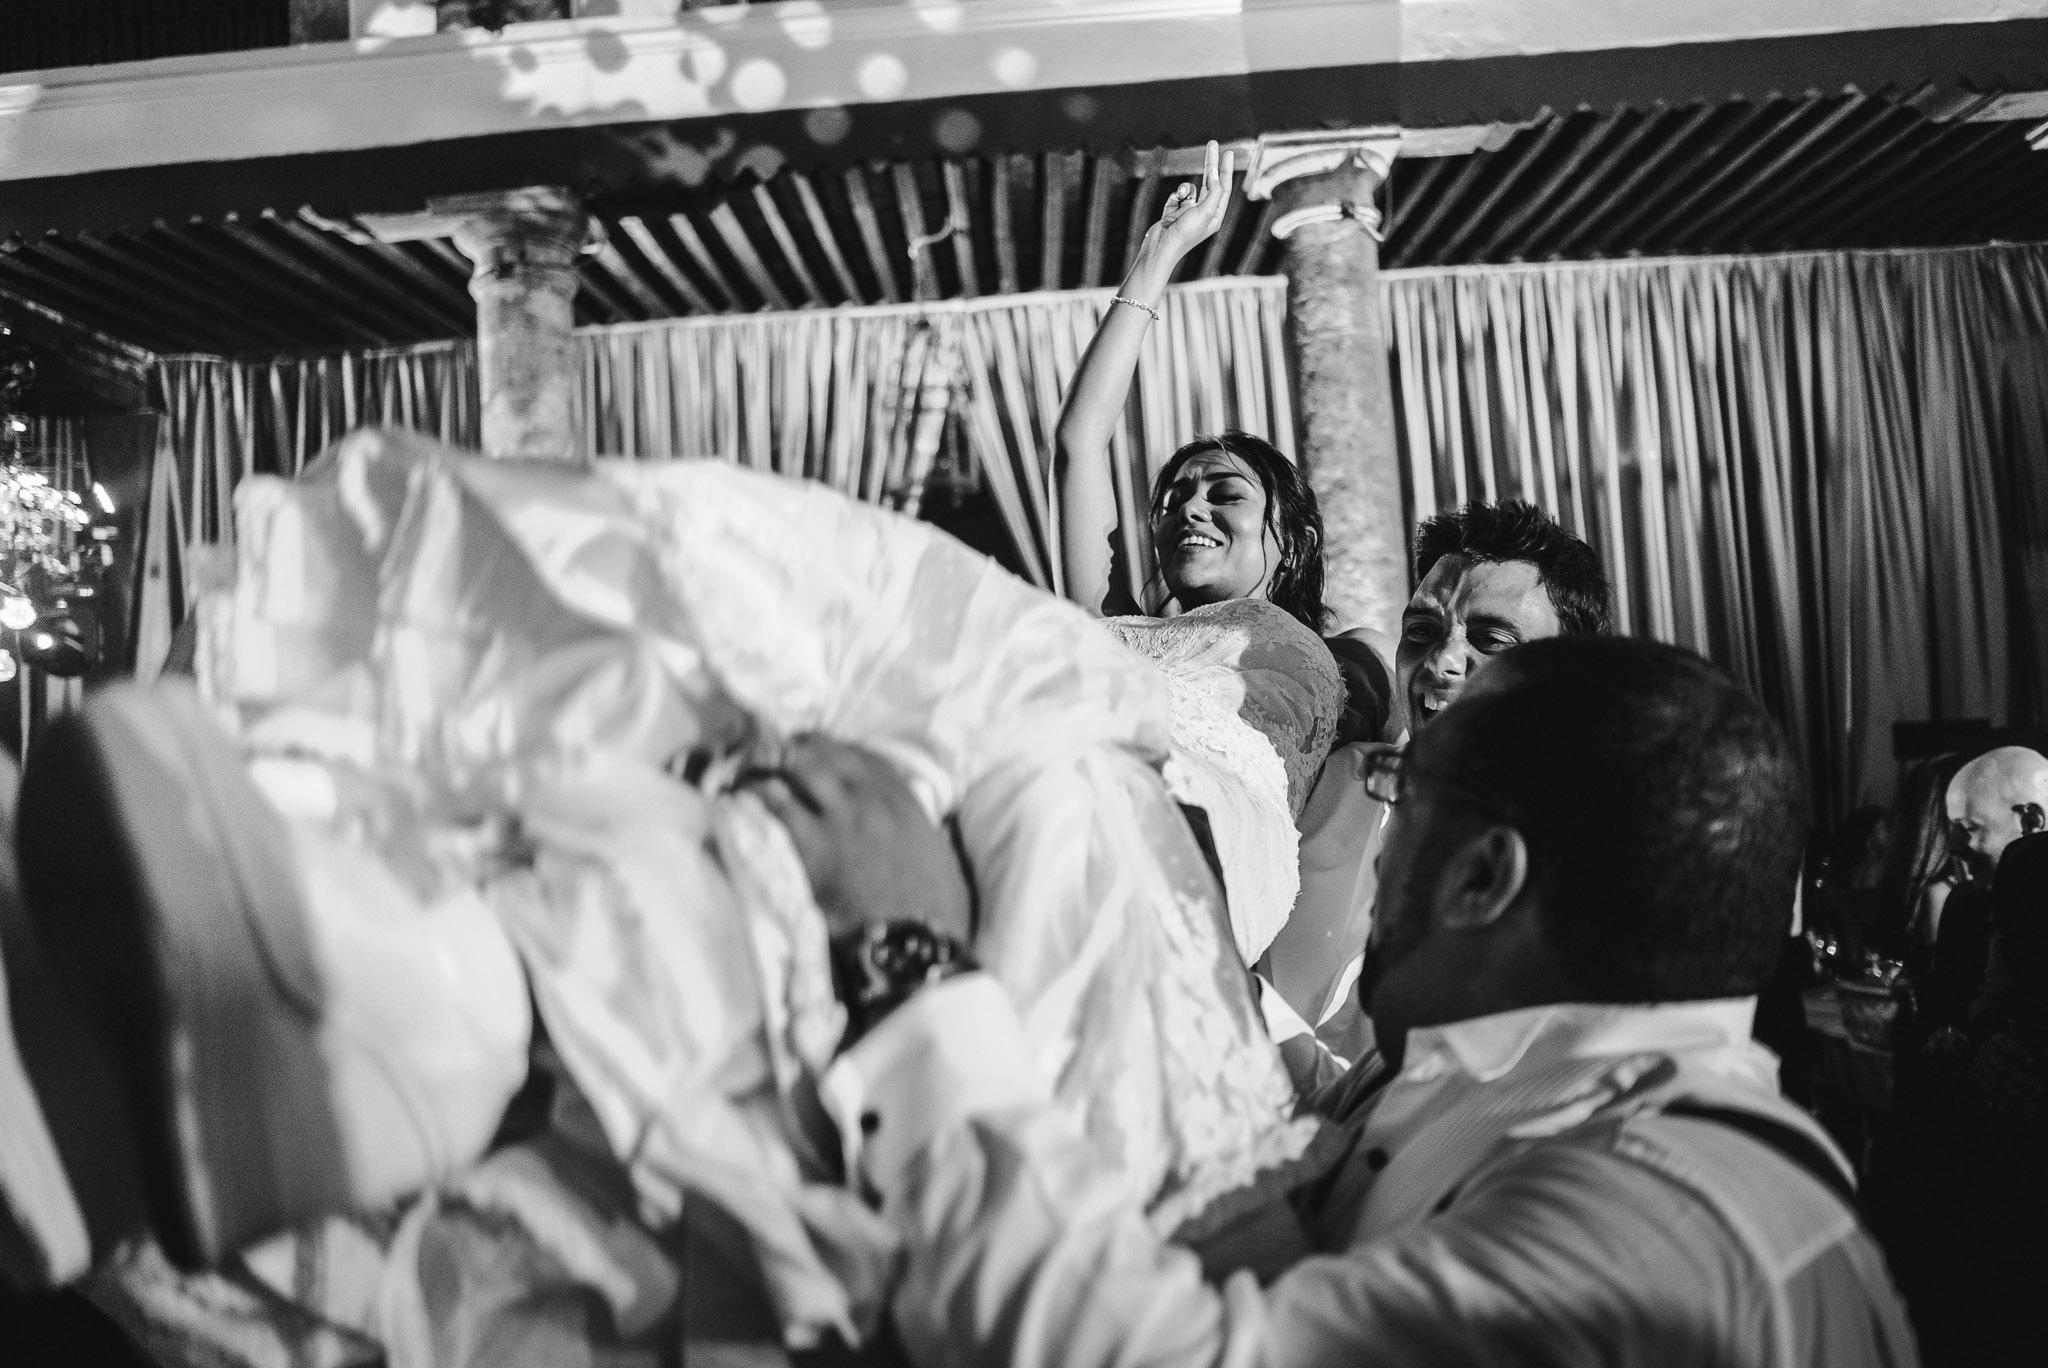 ©www.mauriziosolisbroca.com-20161002maurizio-solis-broca-mexico-canada-wedding-photographer20161002DSC09441-Edit.jpg